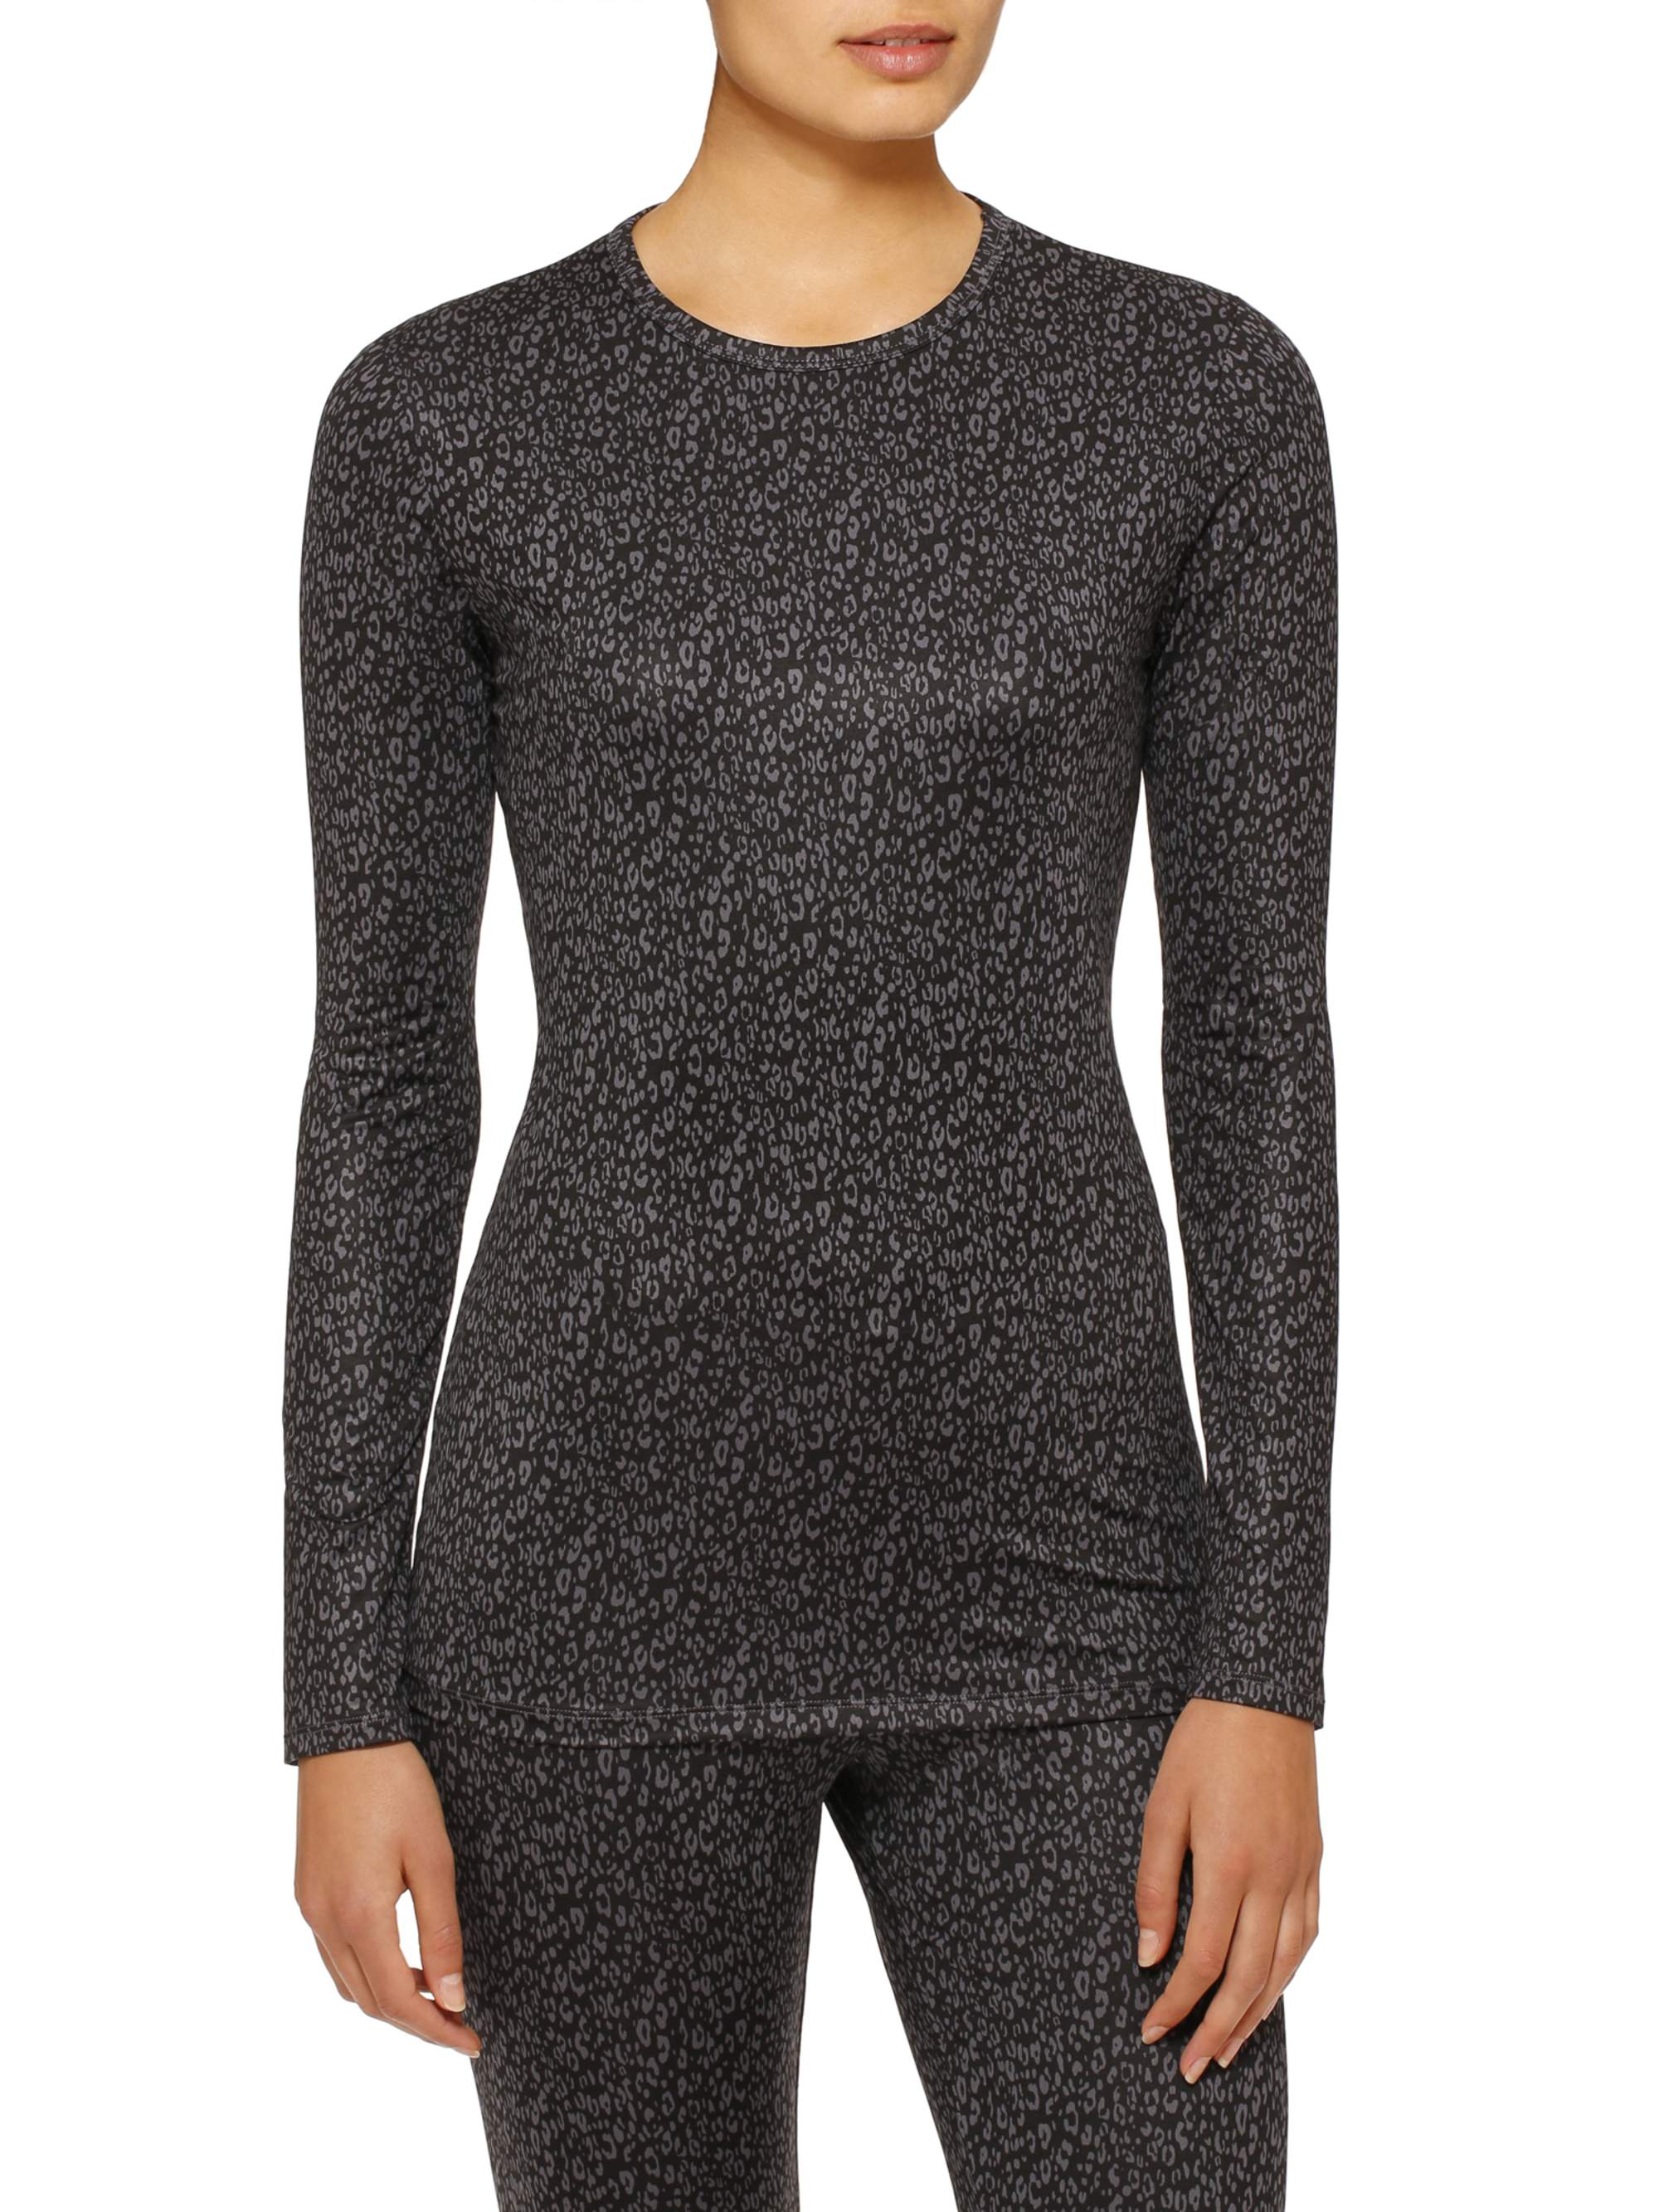 L - Black Cuddl Duds ClimateRight Womens Stretch Fleece Warm Underwear Long Sleeve Top